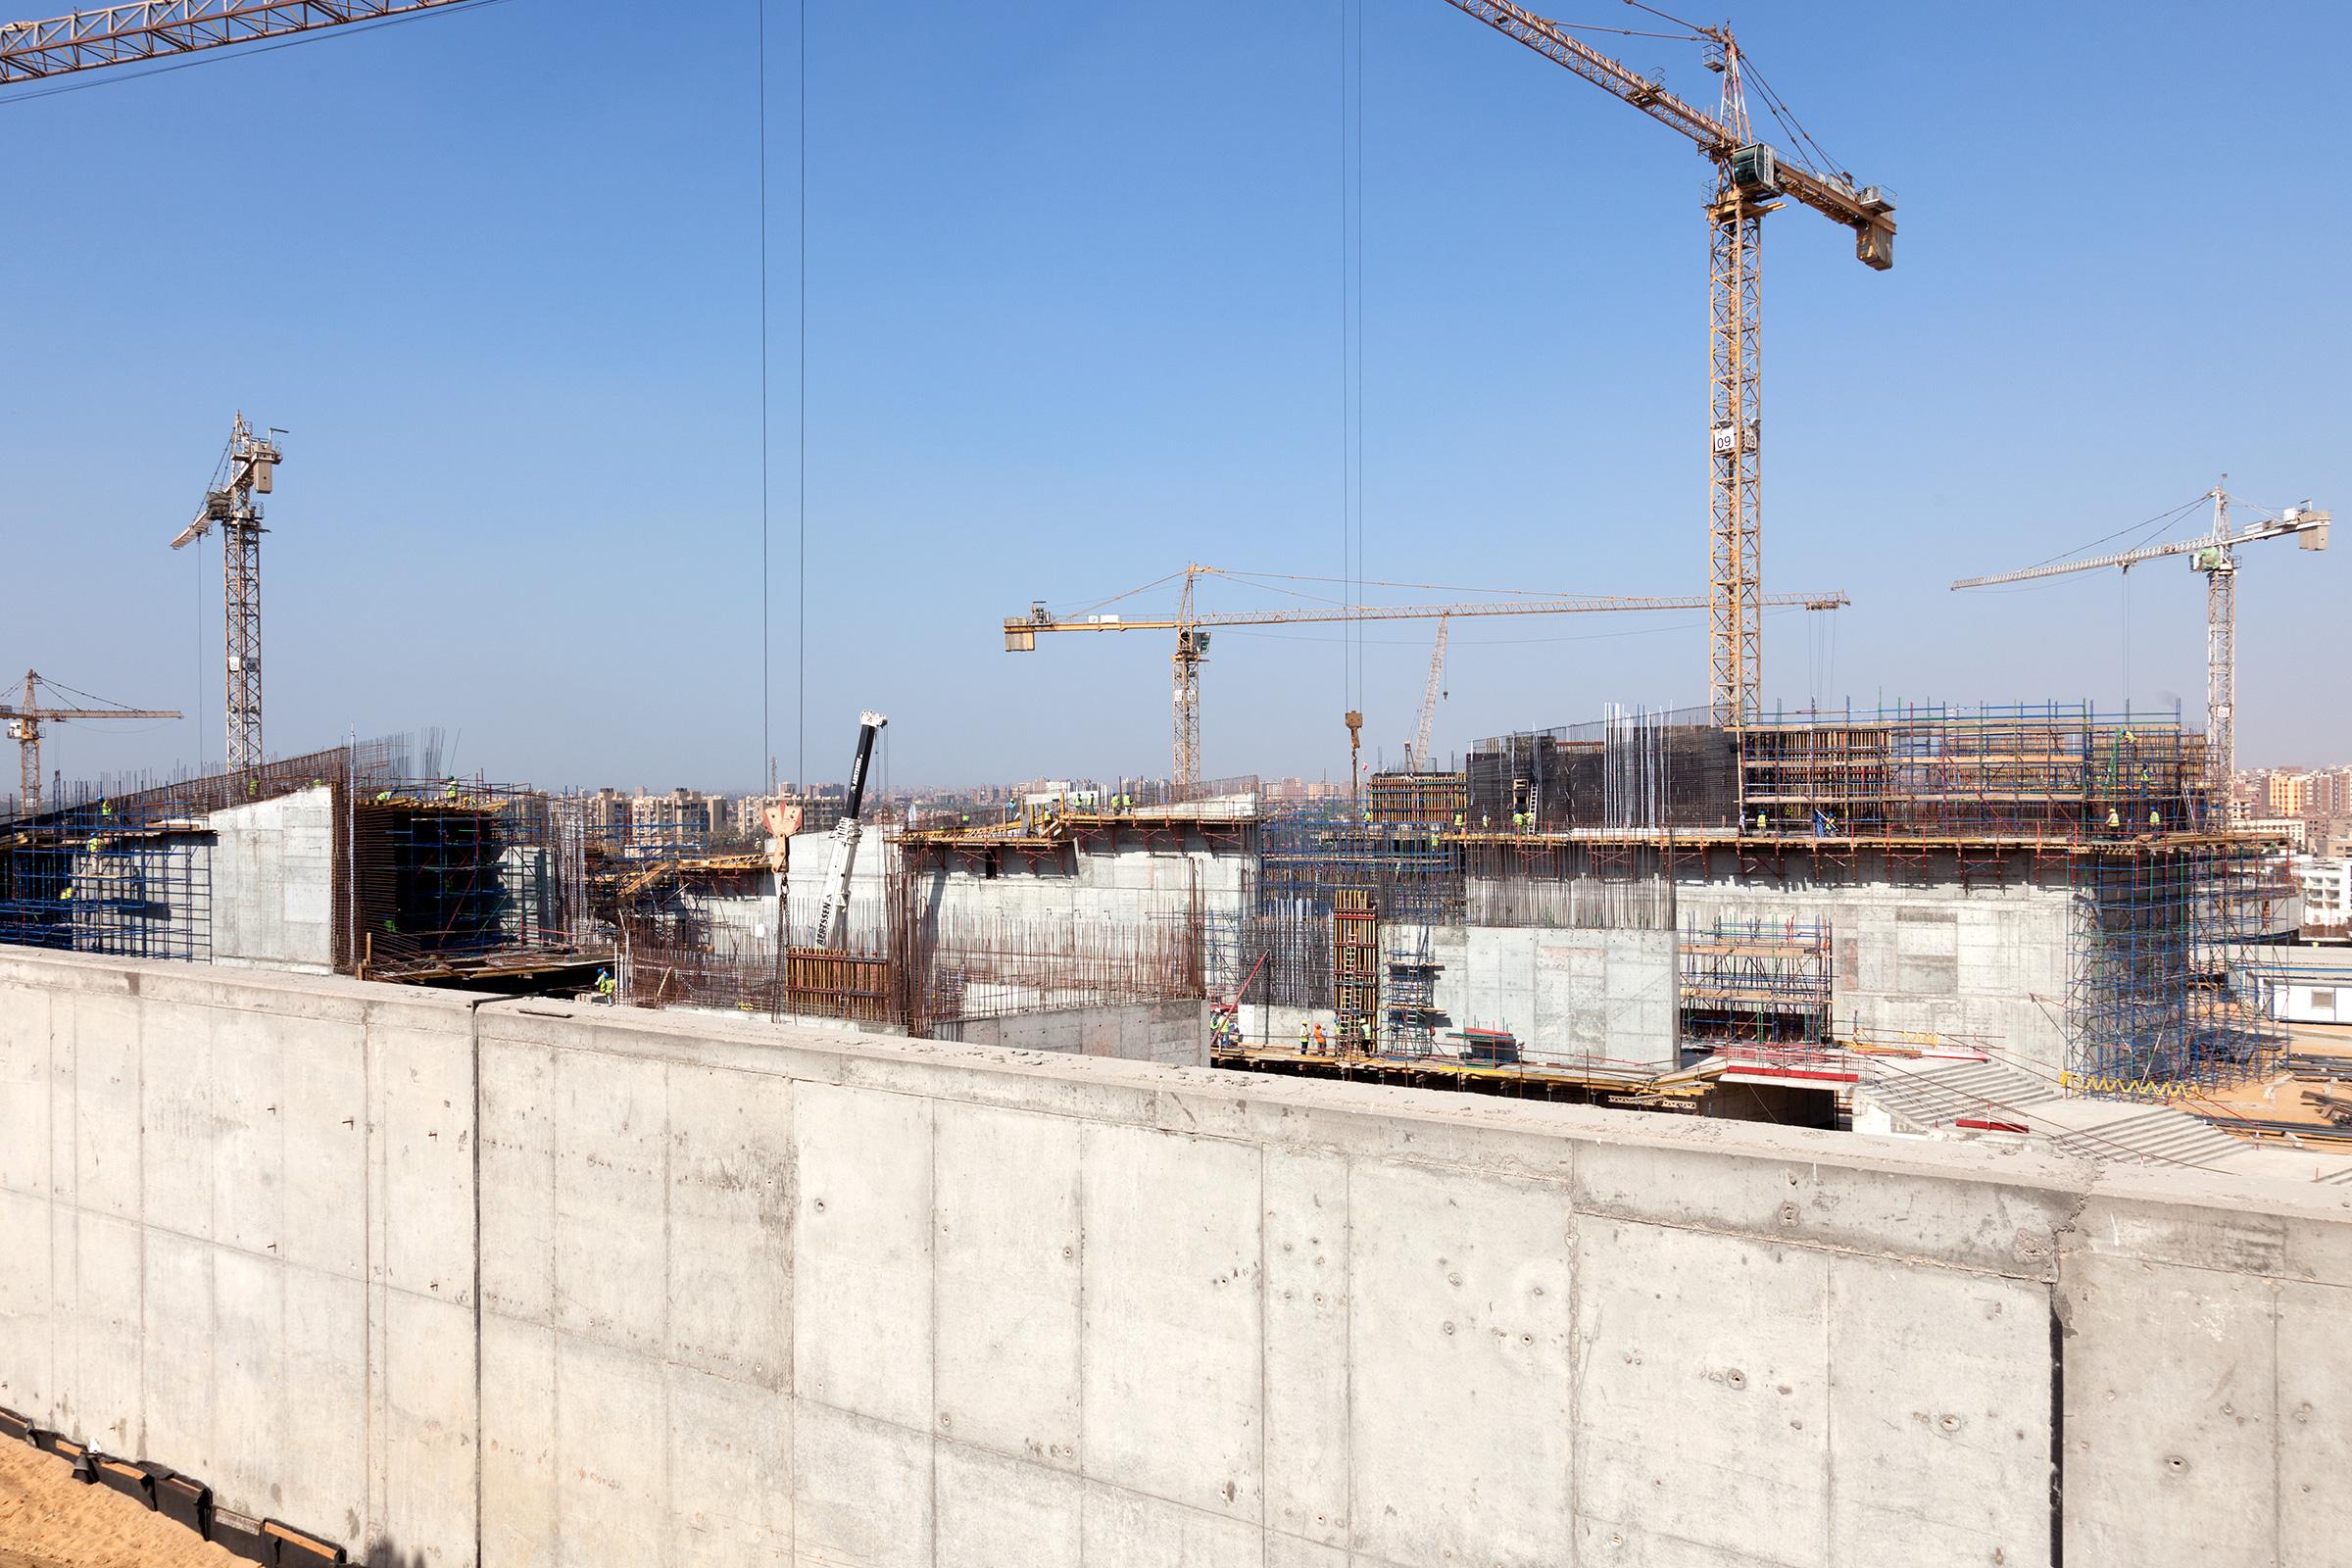 https://upload.wikimedia.org/wikipedia/commons/5/5a/GEM_Under_Construction.jpg